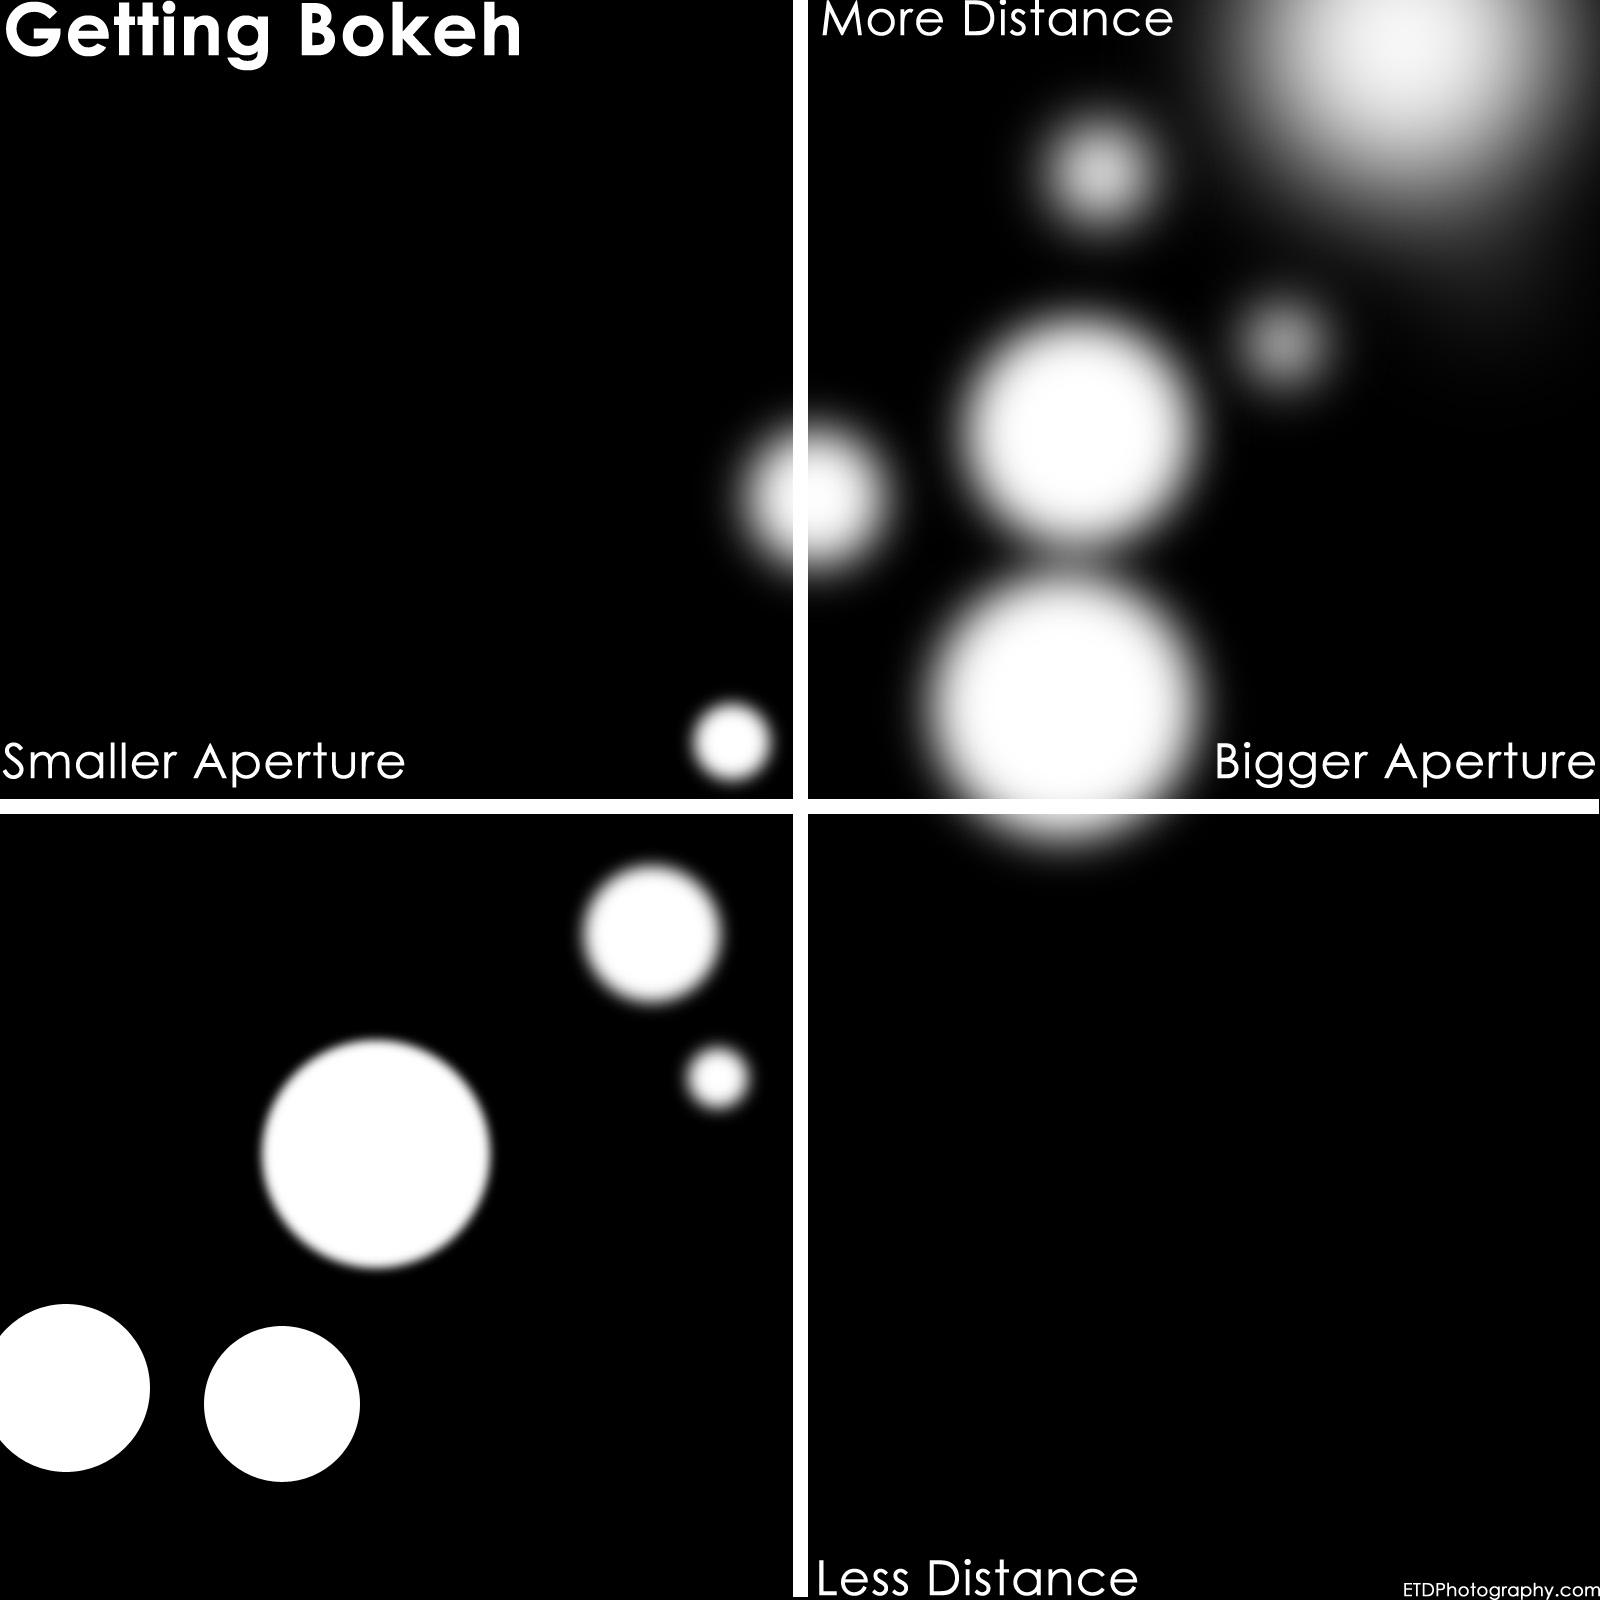 Bigger Aperture + More background/subject distance = More Bokeh!